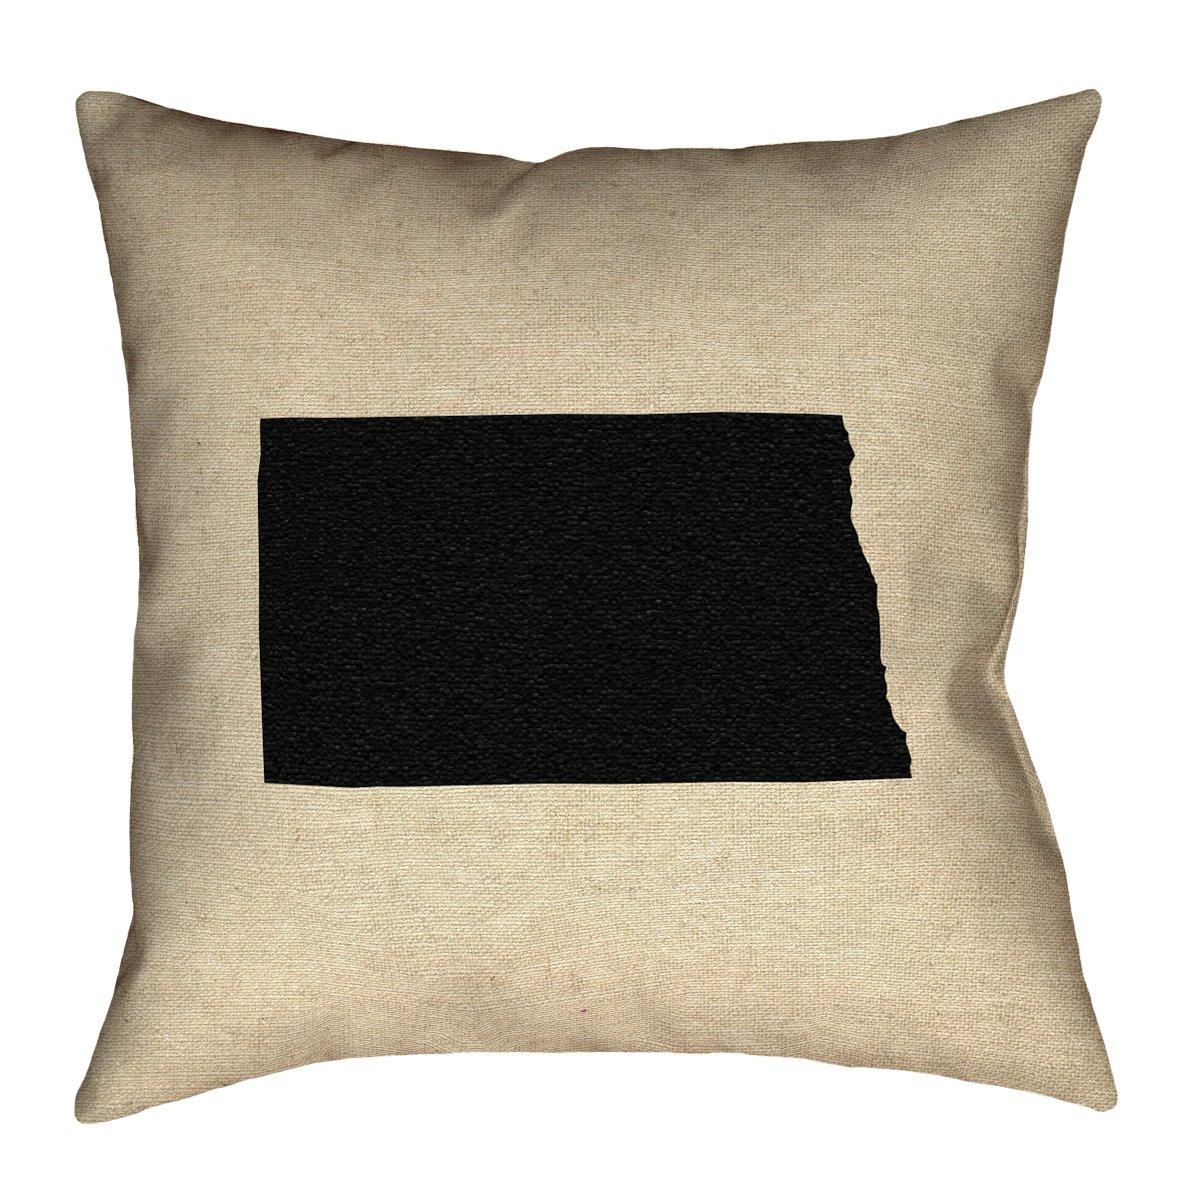 ArtVerse Katelyn Smith 16 x 16 Spun Polyester Double Sided Print with Concealed Zipper /& Insert North Dakota Pillow